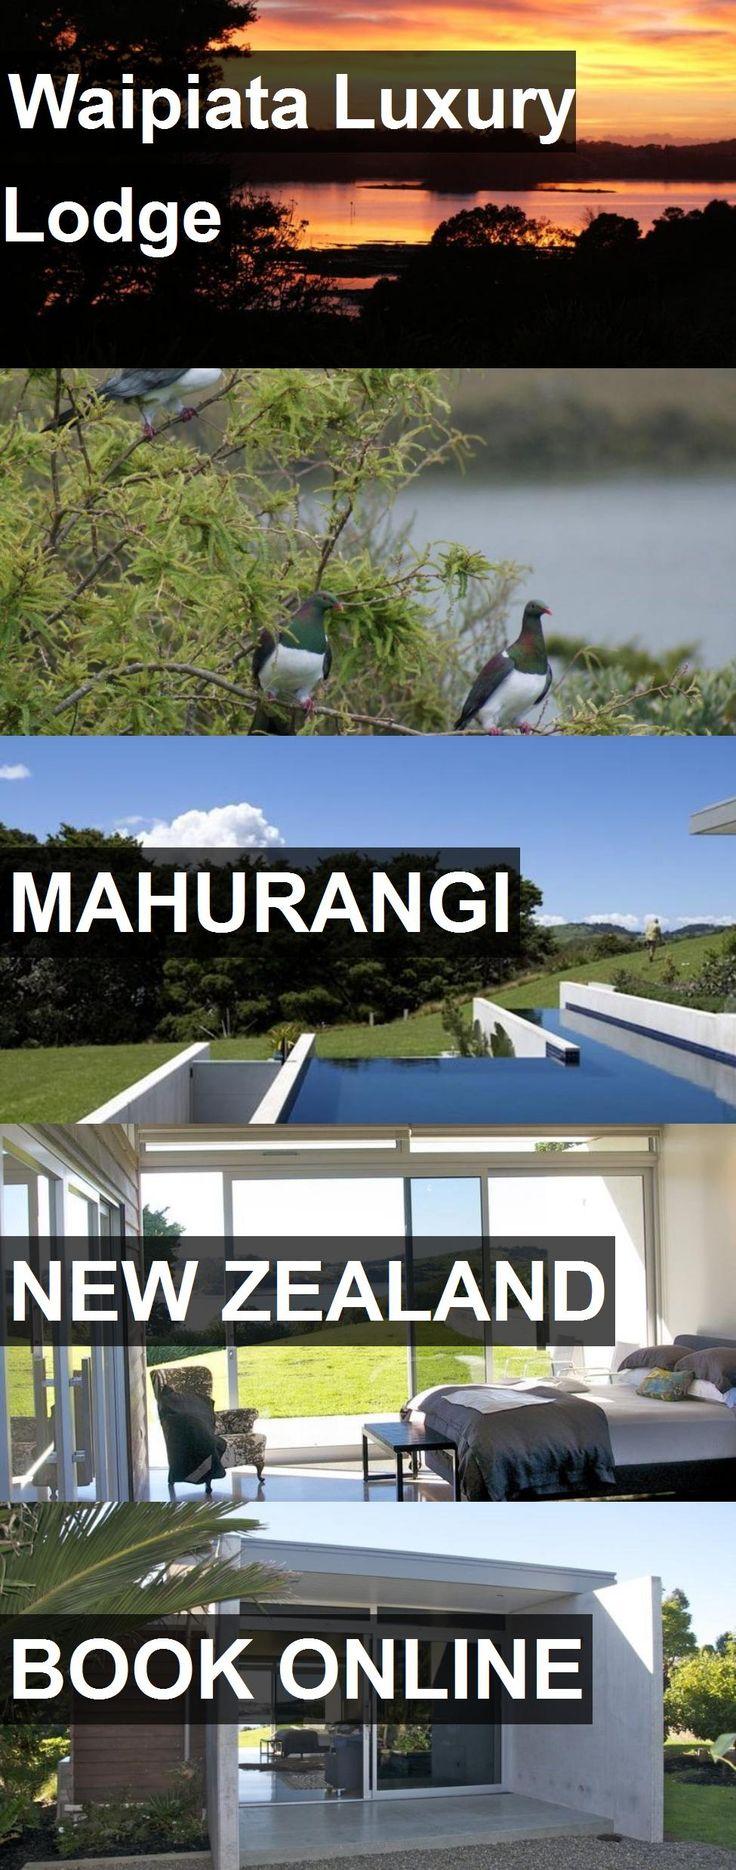 Hotel Waipiata Luxury Lodge in Mahurangi, New Zealand. For more information, photos, reviews and best prices please follow the link. #NewZealand #Mahurangi #travel #vacation #hotel